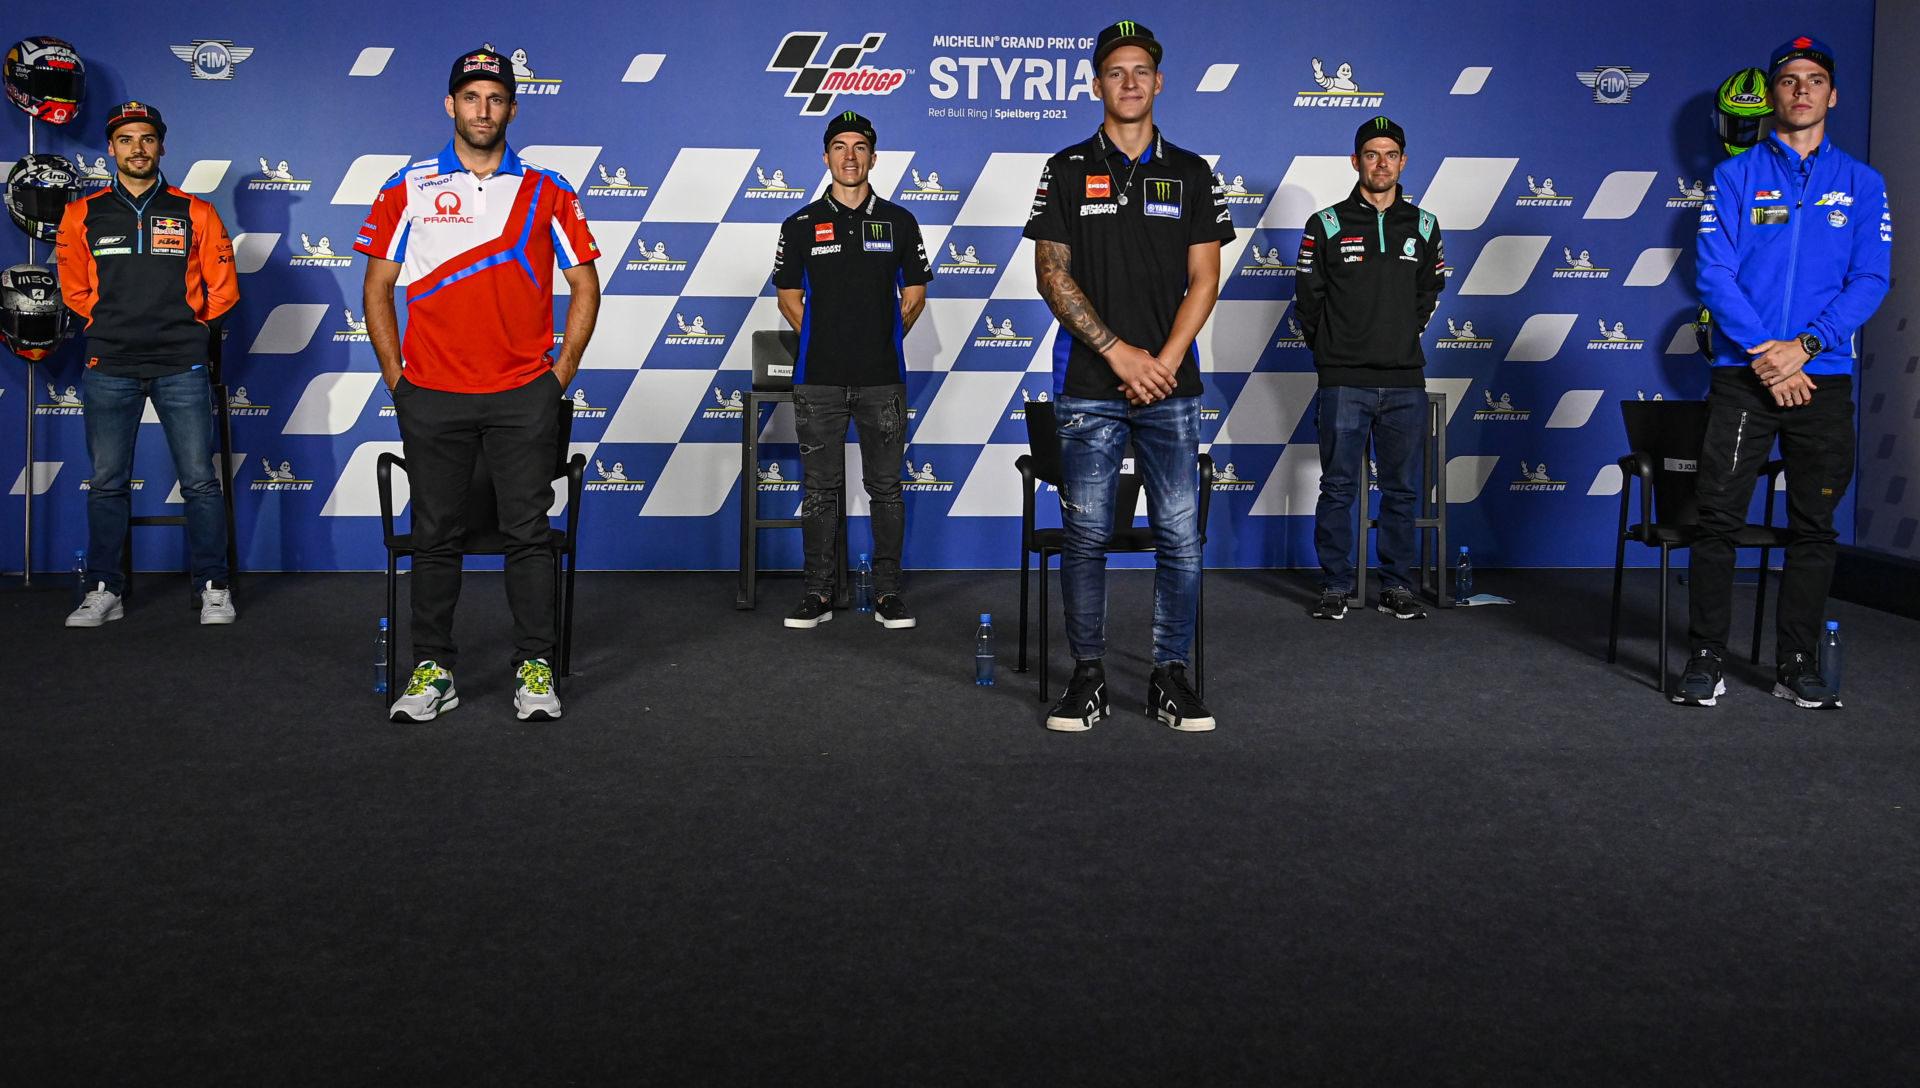 MotoGP racers (from left): Miguel Oliveira, Johann Zarco, Maverick Vinales, Fabio Quartararo, Cal Crutchlow, and Joan Mir at the pre-event press conference in Austria. Photo courtesy Dorna.